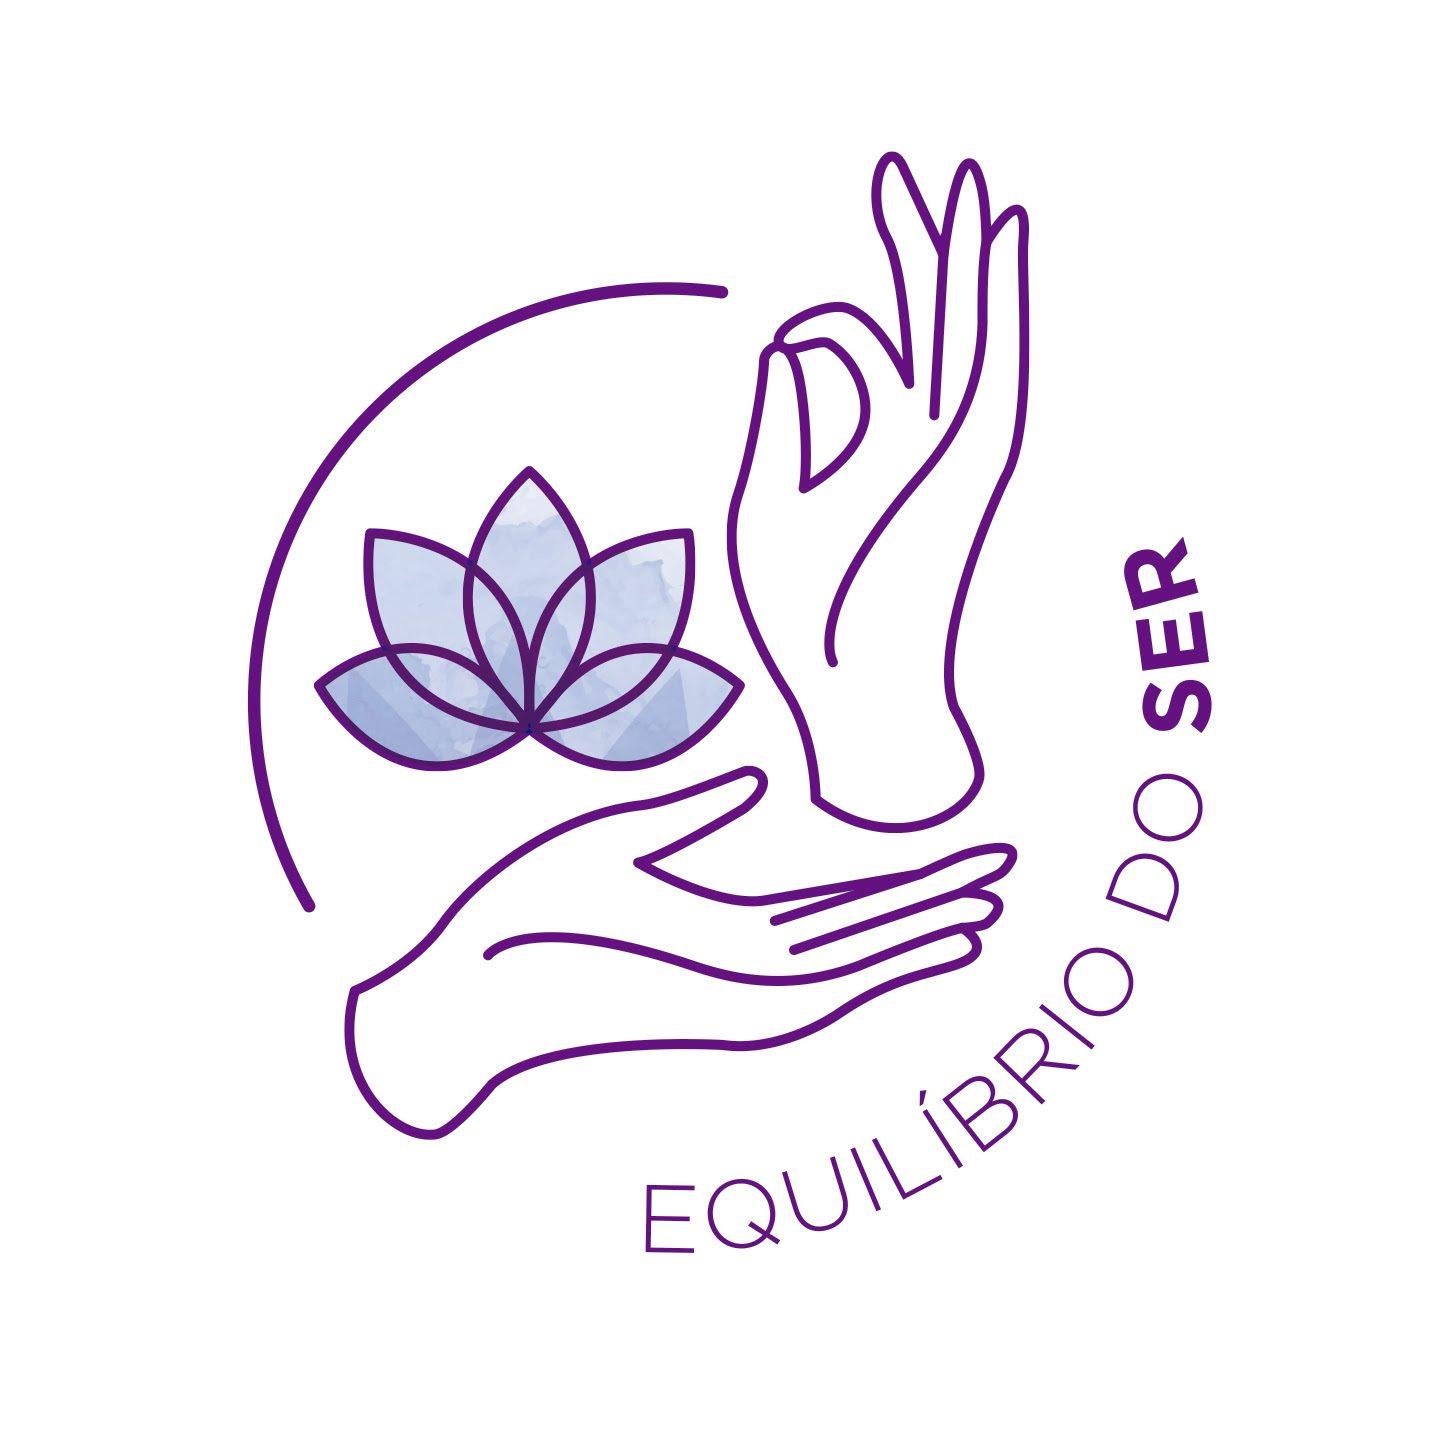 Equilíbrio do Ser – Coaching, Terapia Emocional, Terapia Energética